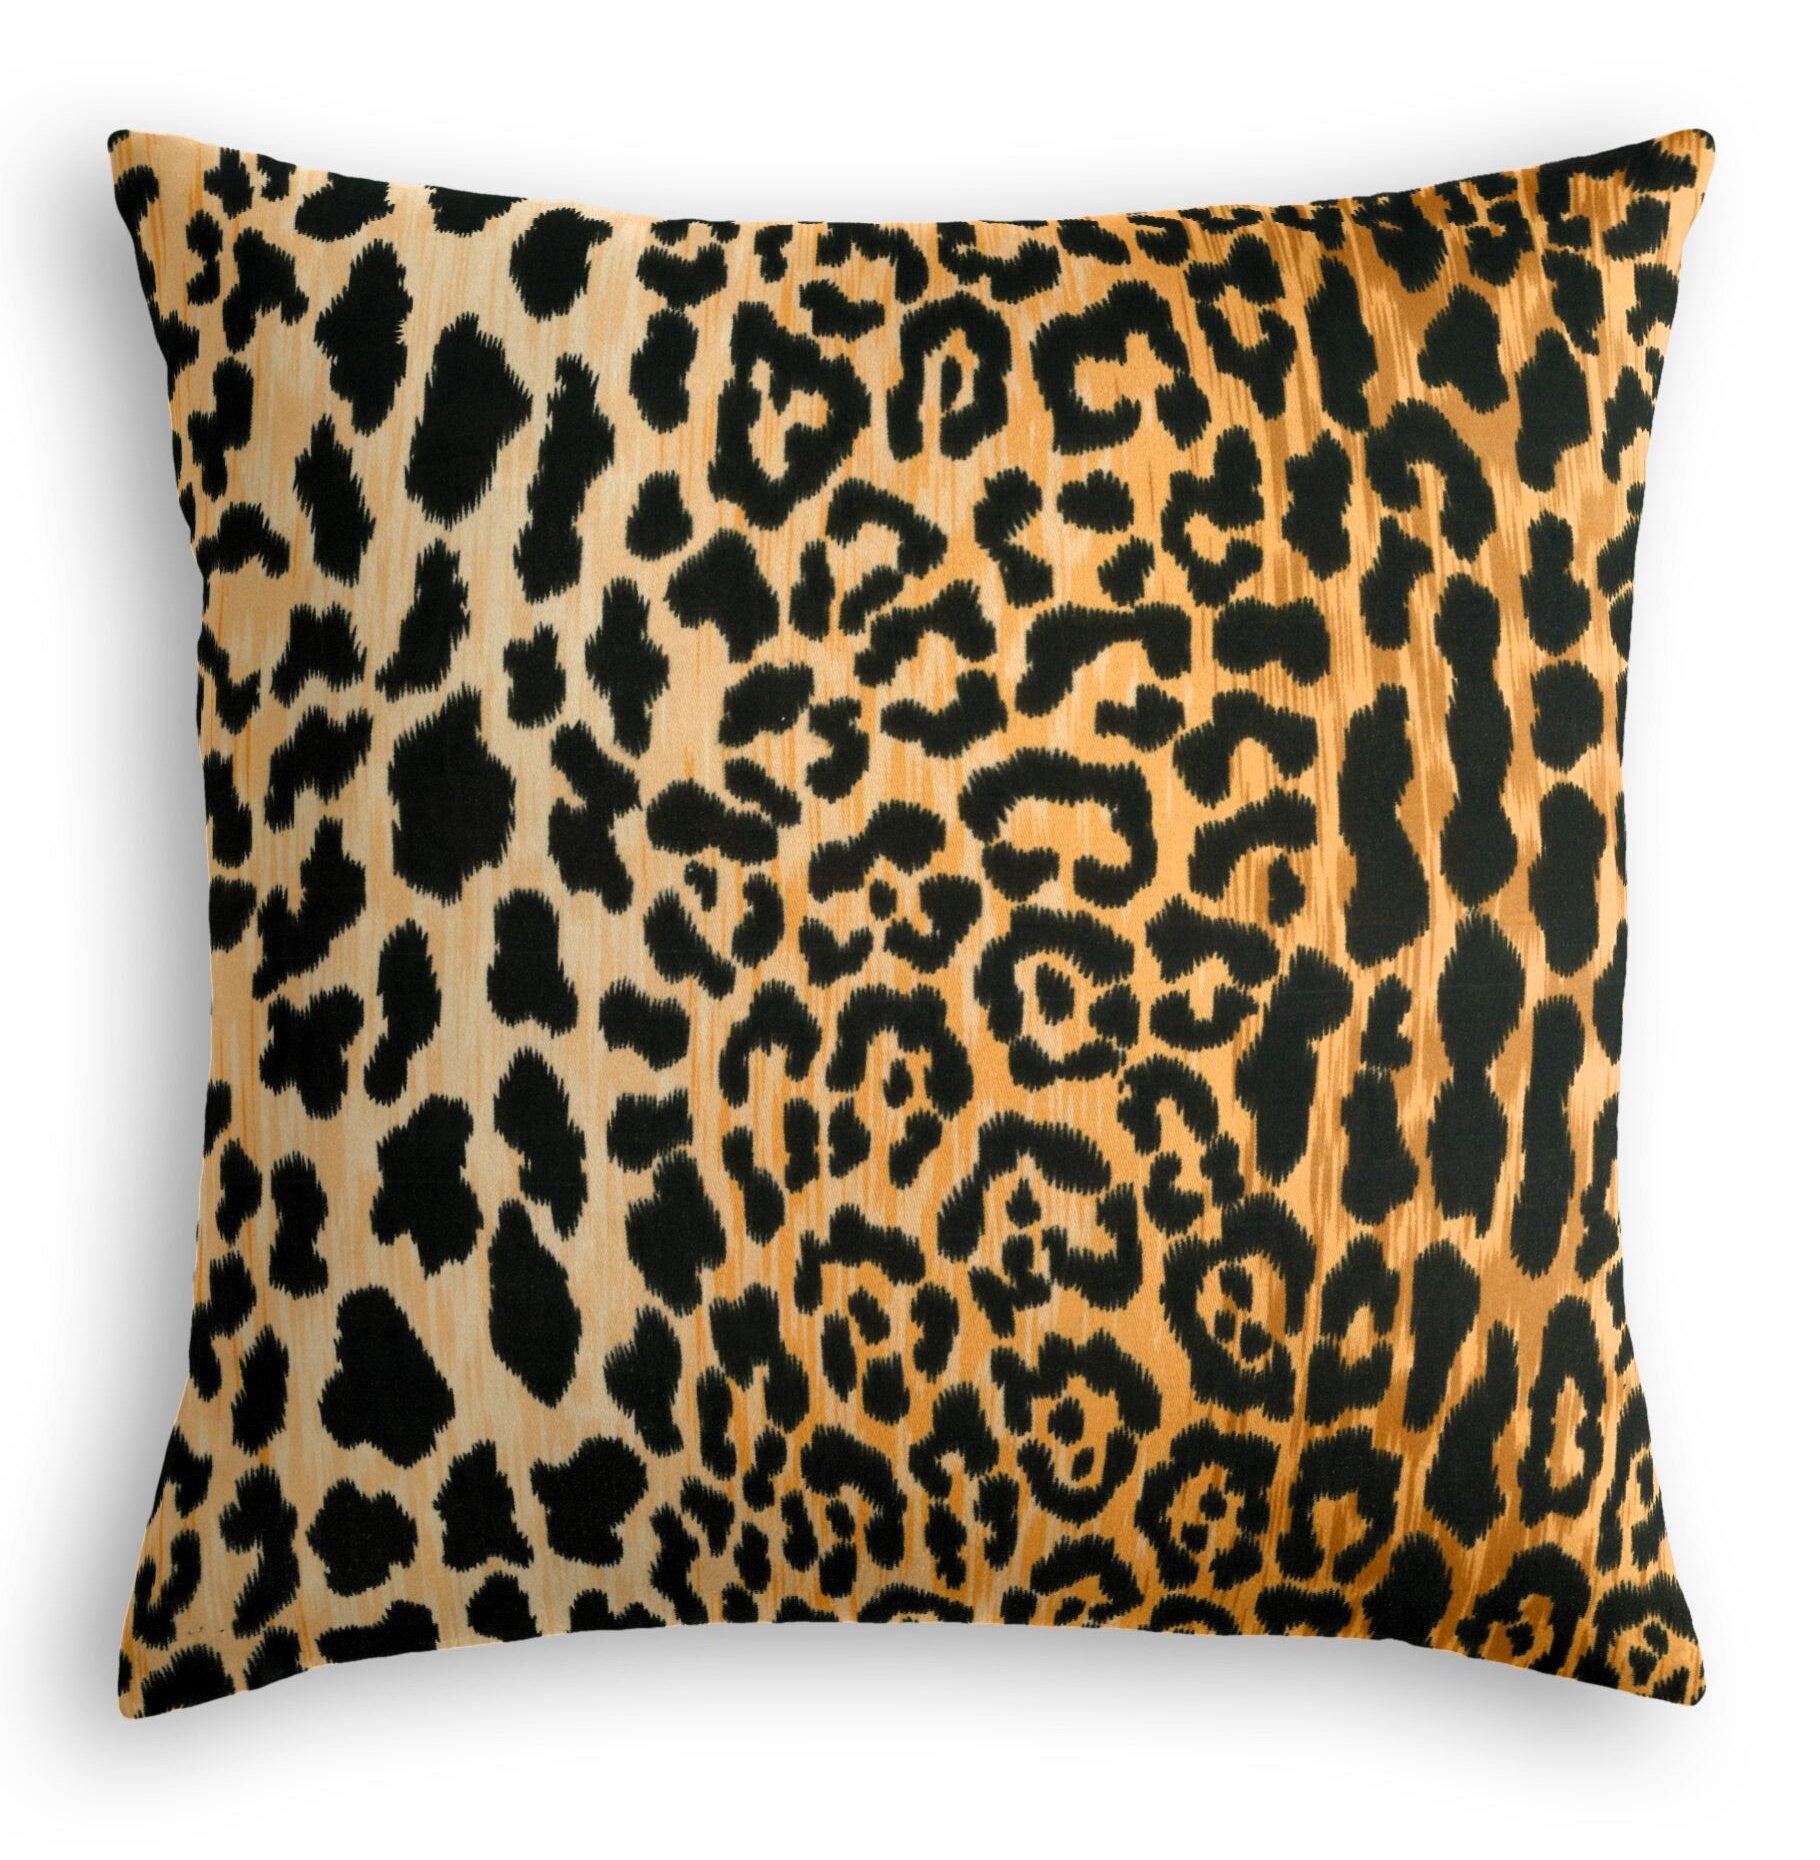 22 Square Animal Print Throw Pillows You Ll Love In 2021 Wayfair